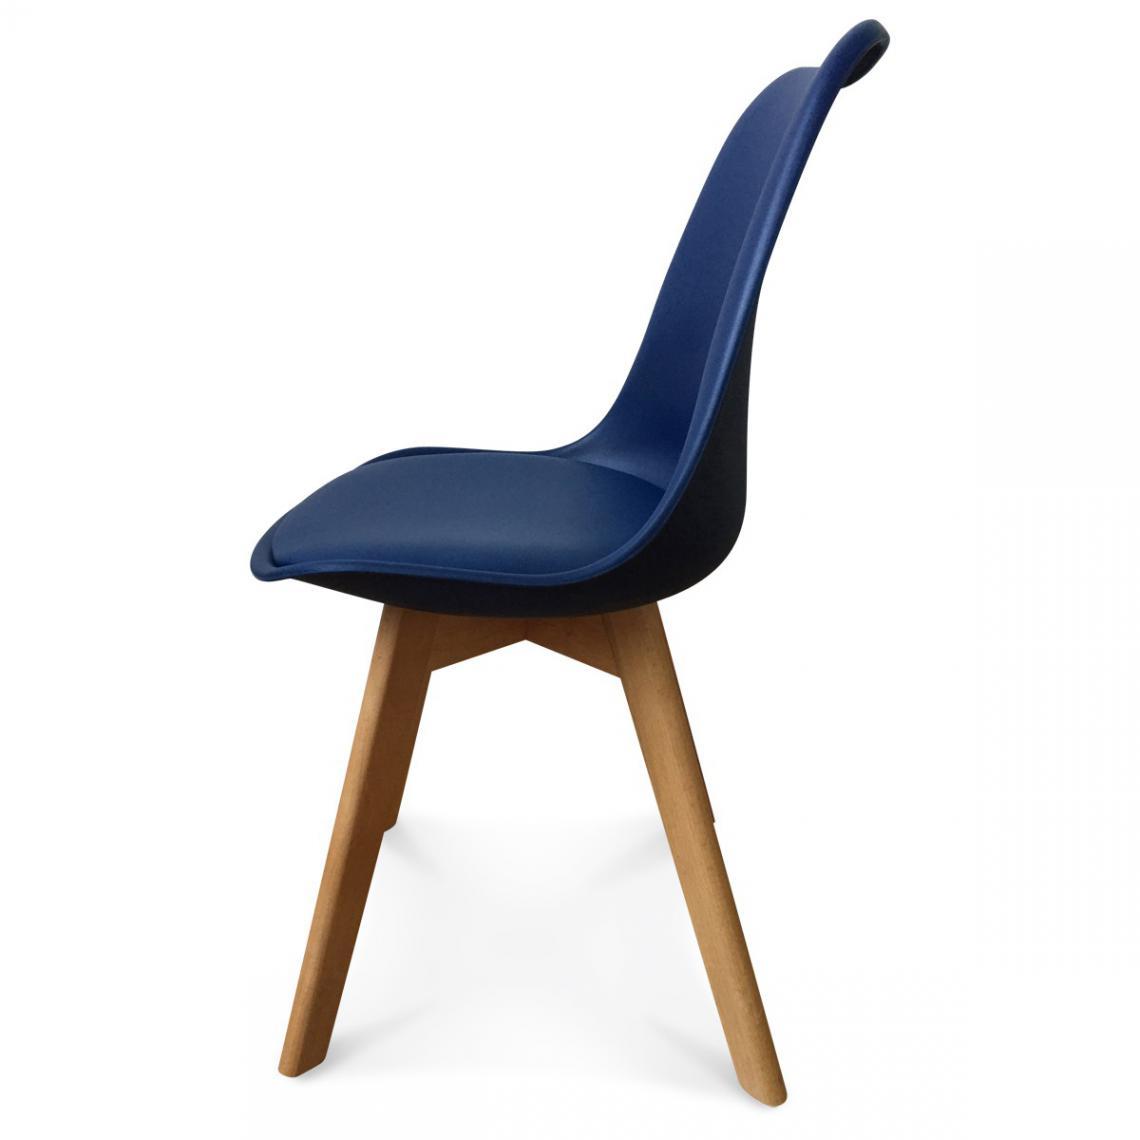 chaise design style scandinave bleu marine esben